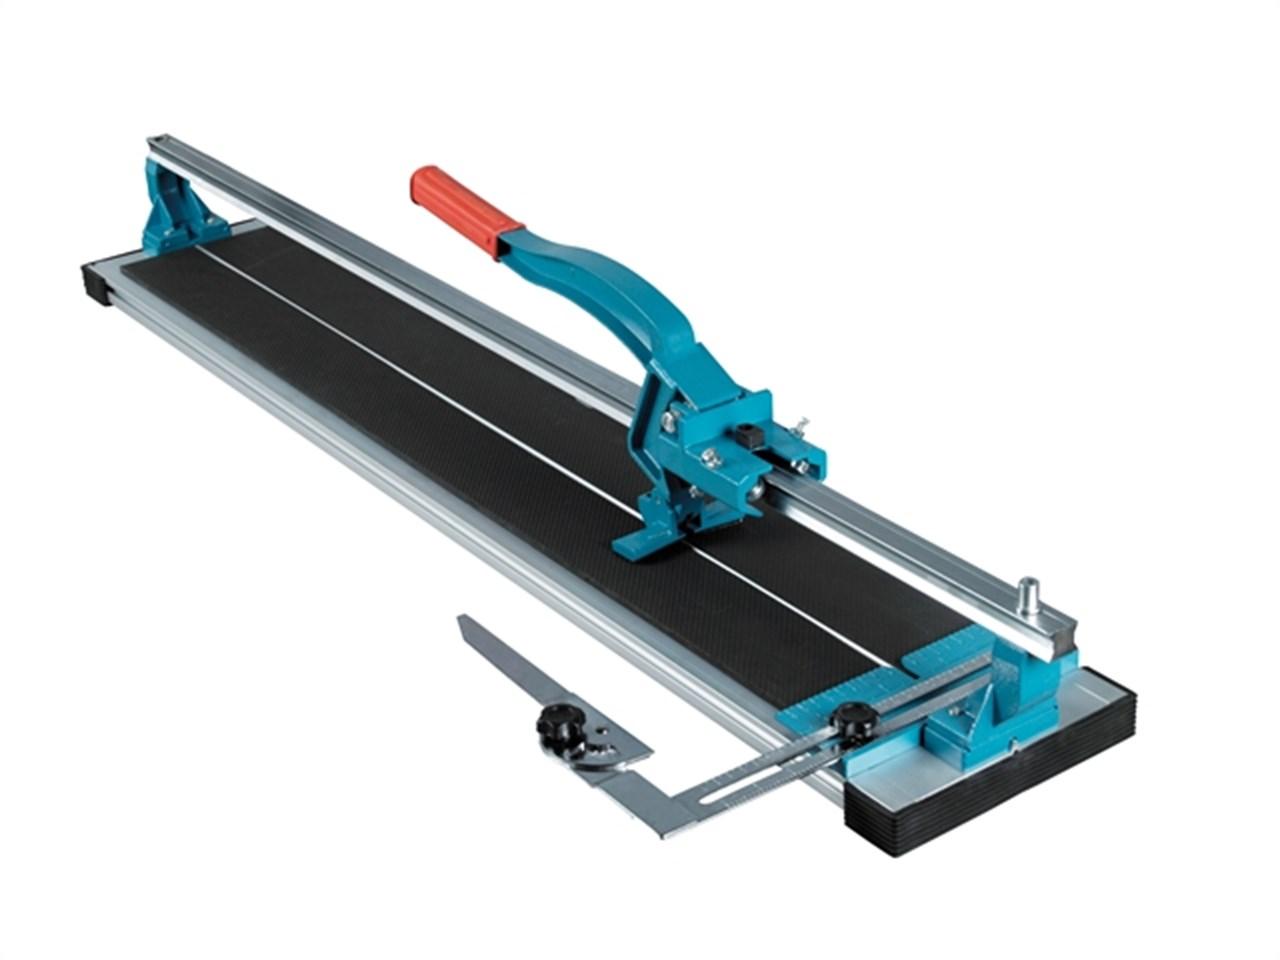 Vitrex Vitmtc1200 Mtc1200 Manual Tile Cutter 1200mm